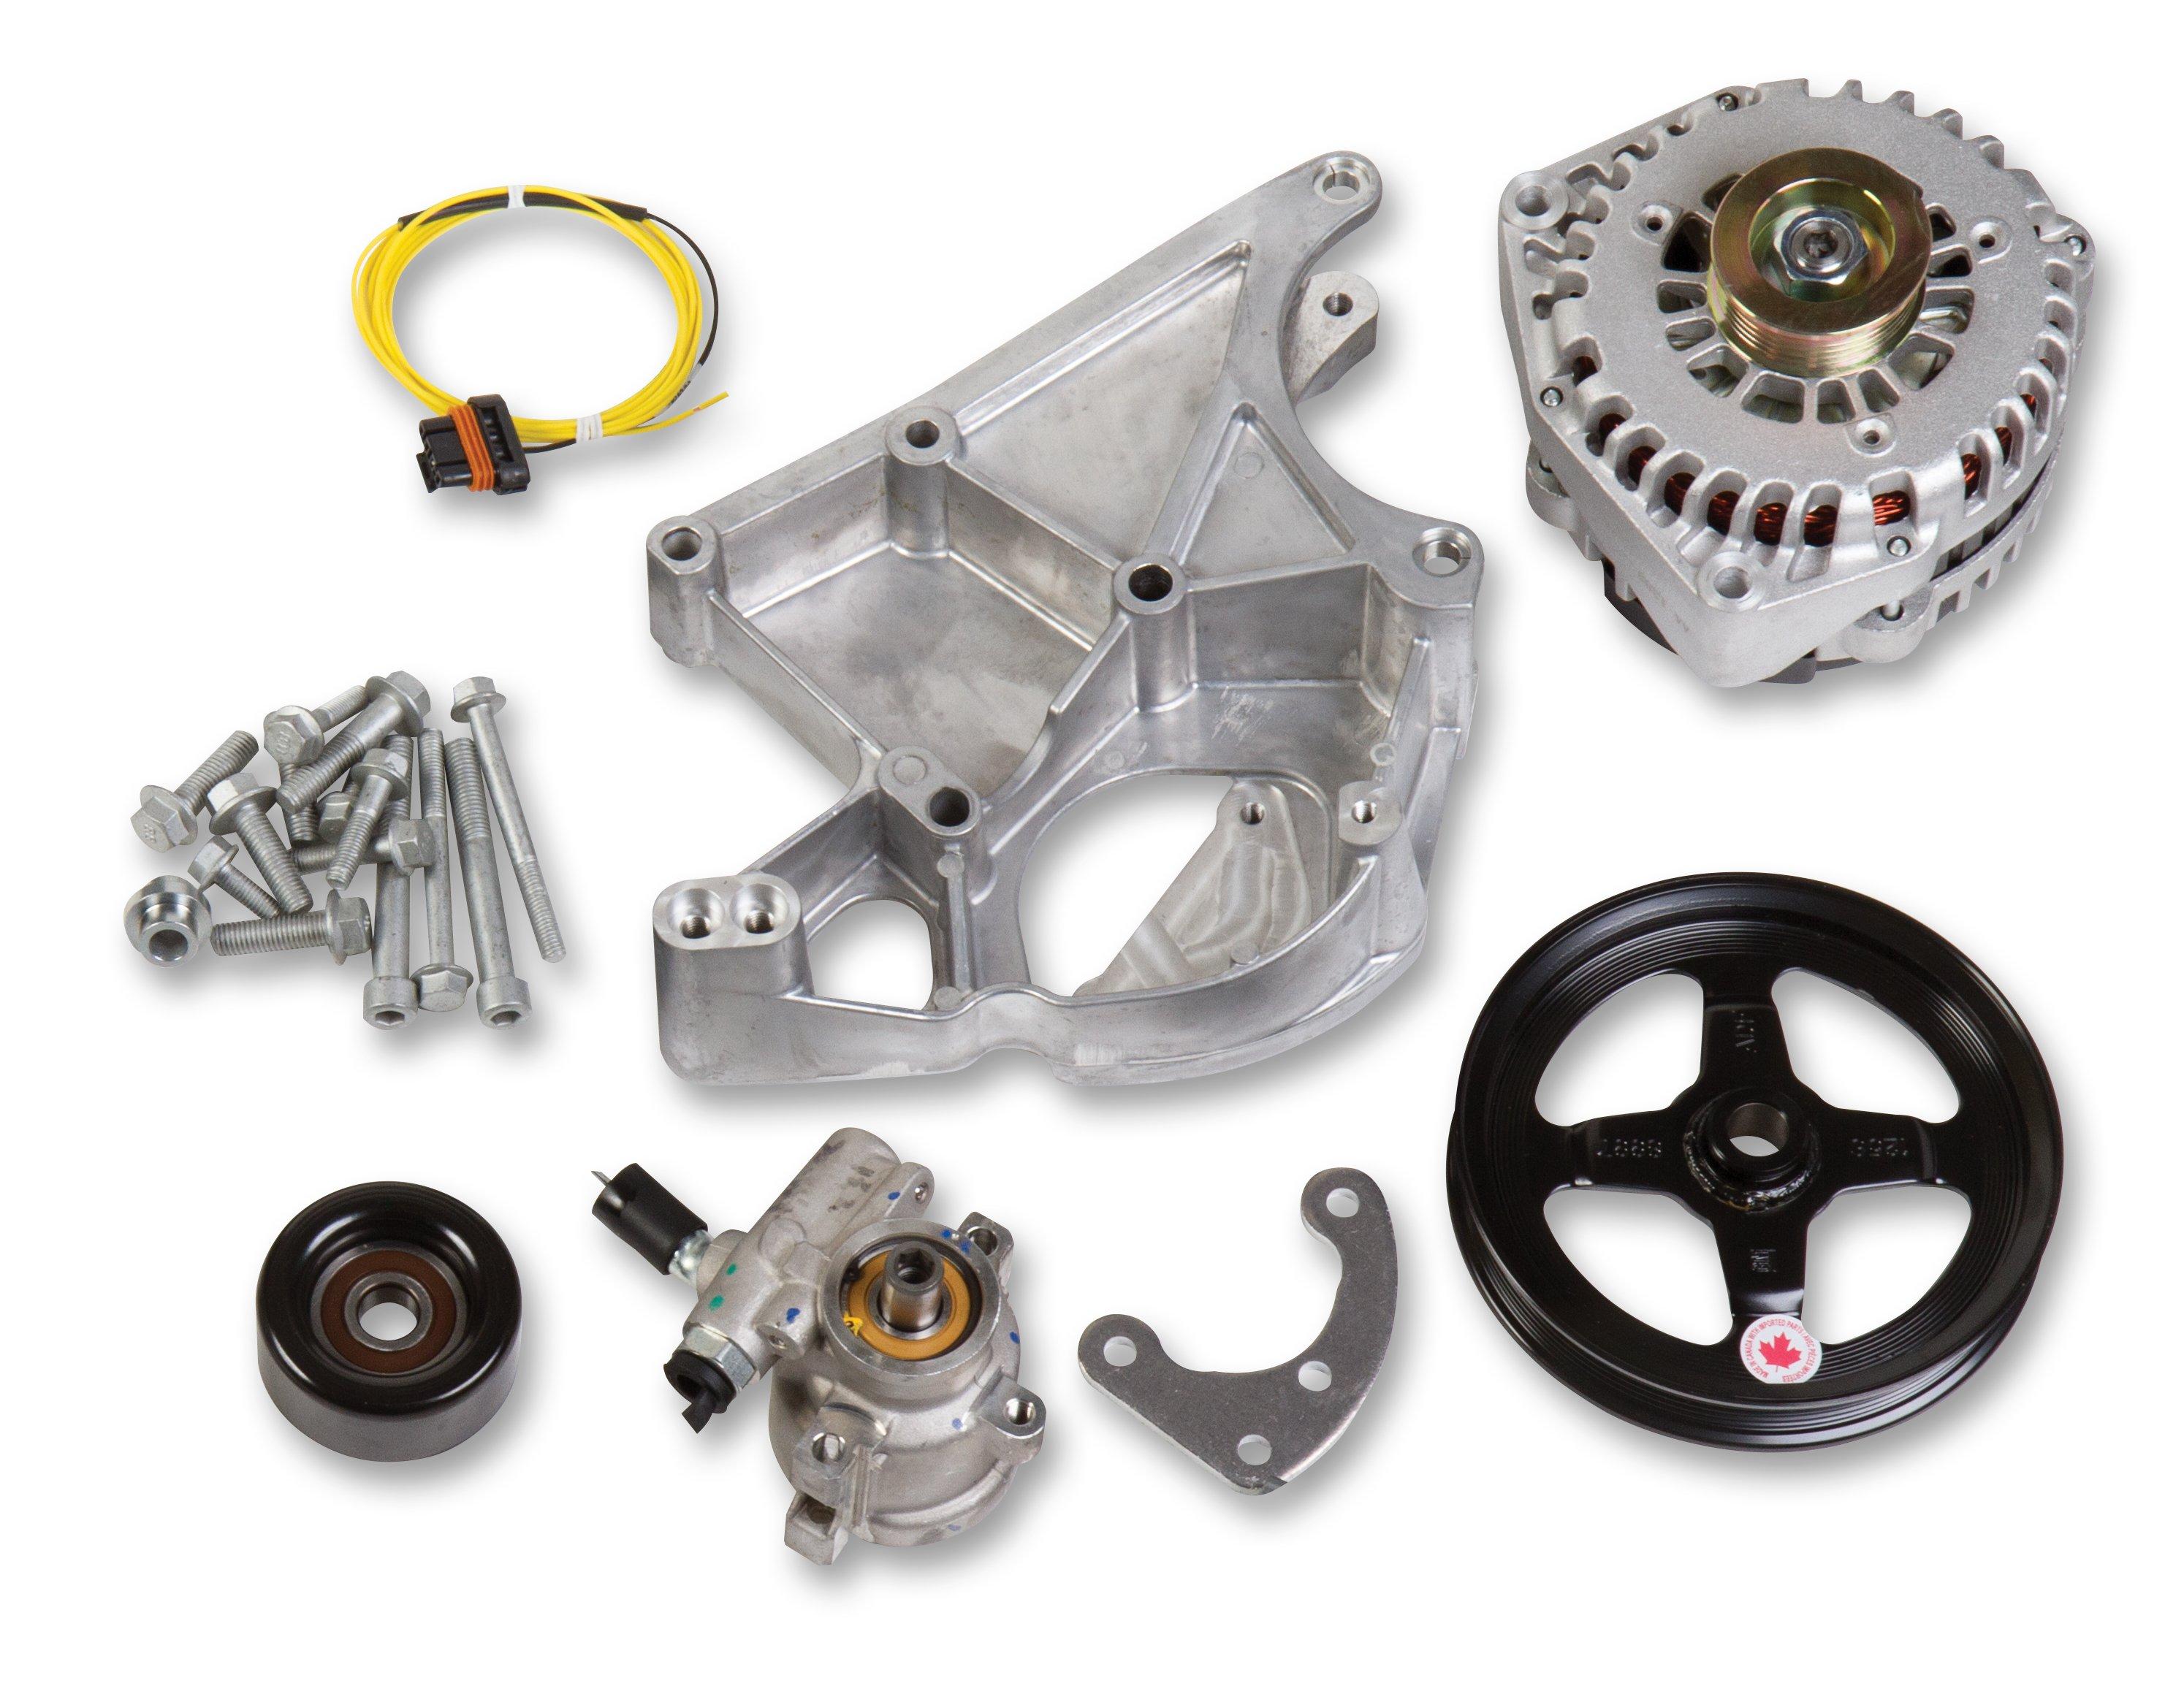 LS/LT Alternator & Power Steering Pump Accessory Drive Kit - Driver's Side  Bracket